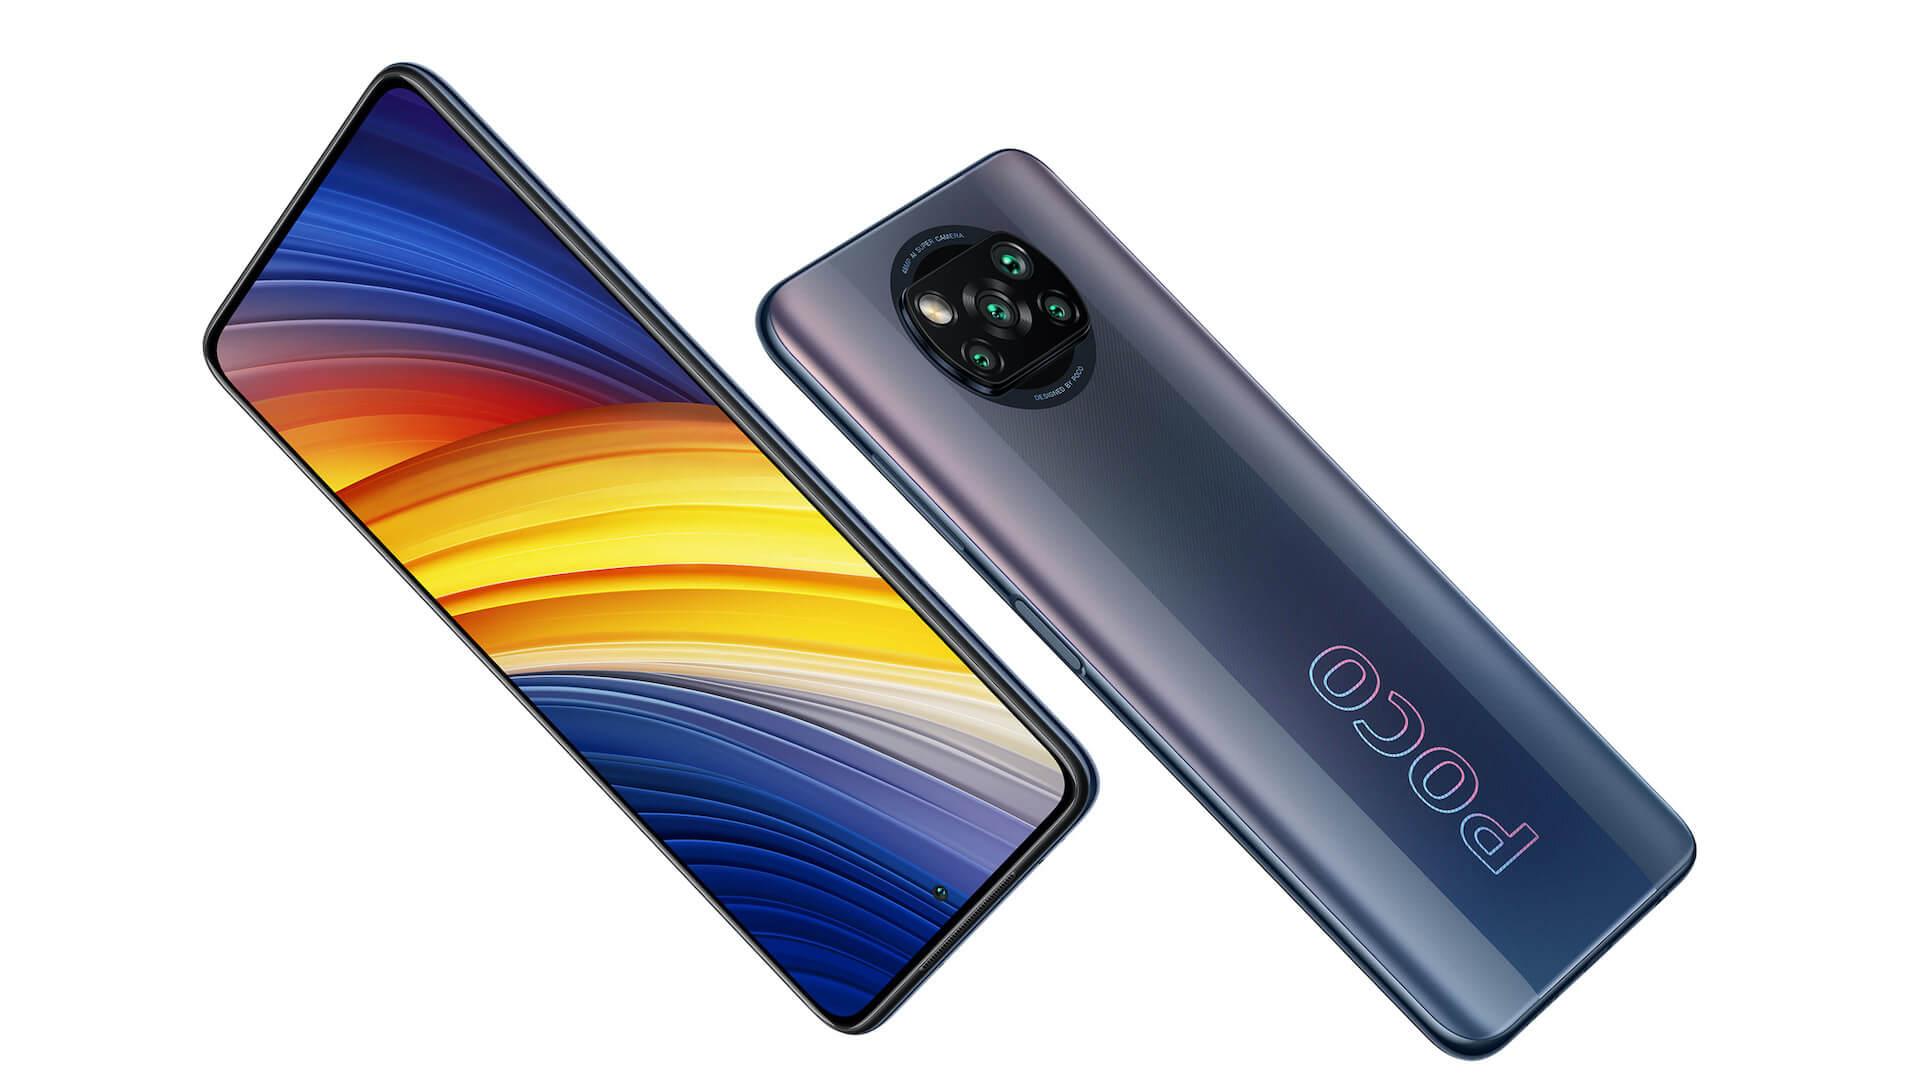 Представлен Poco X3 Pro – Snapdragon 860, AMOLED, 120 Гц и NFC за €249